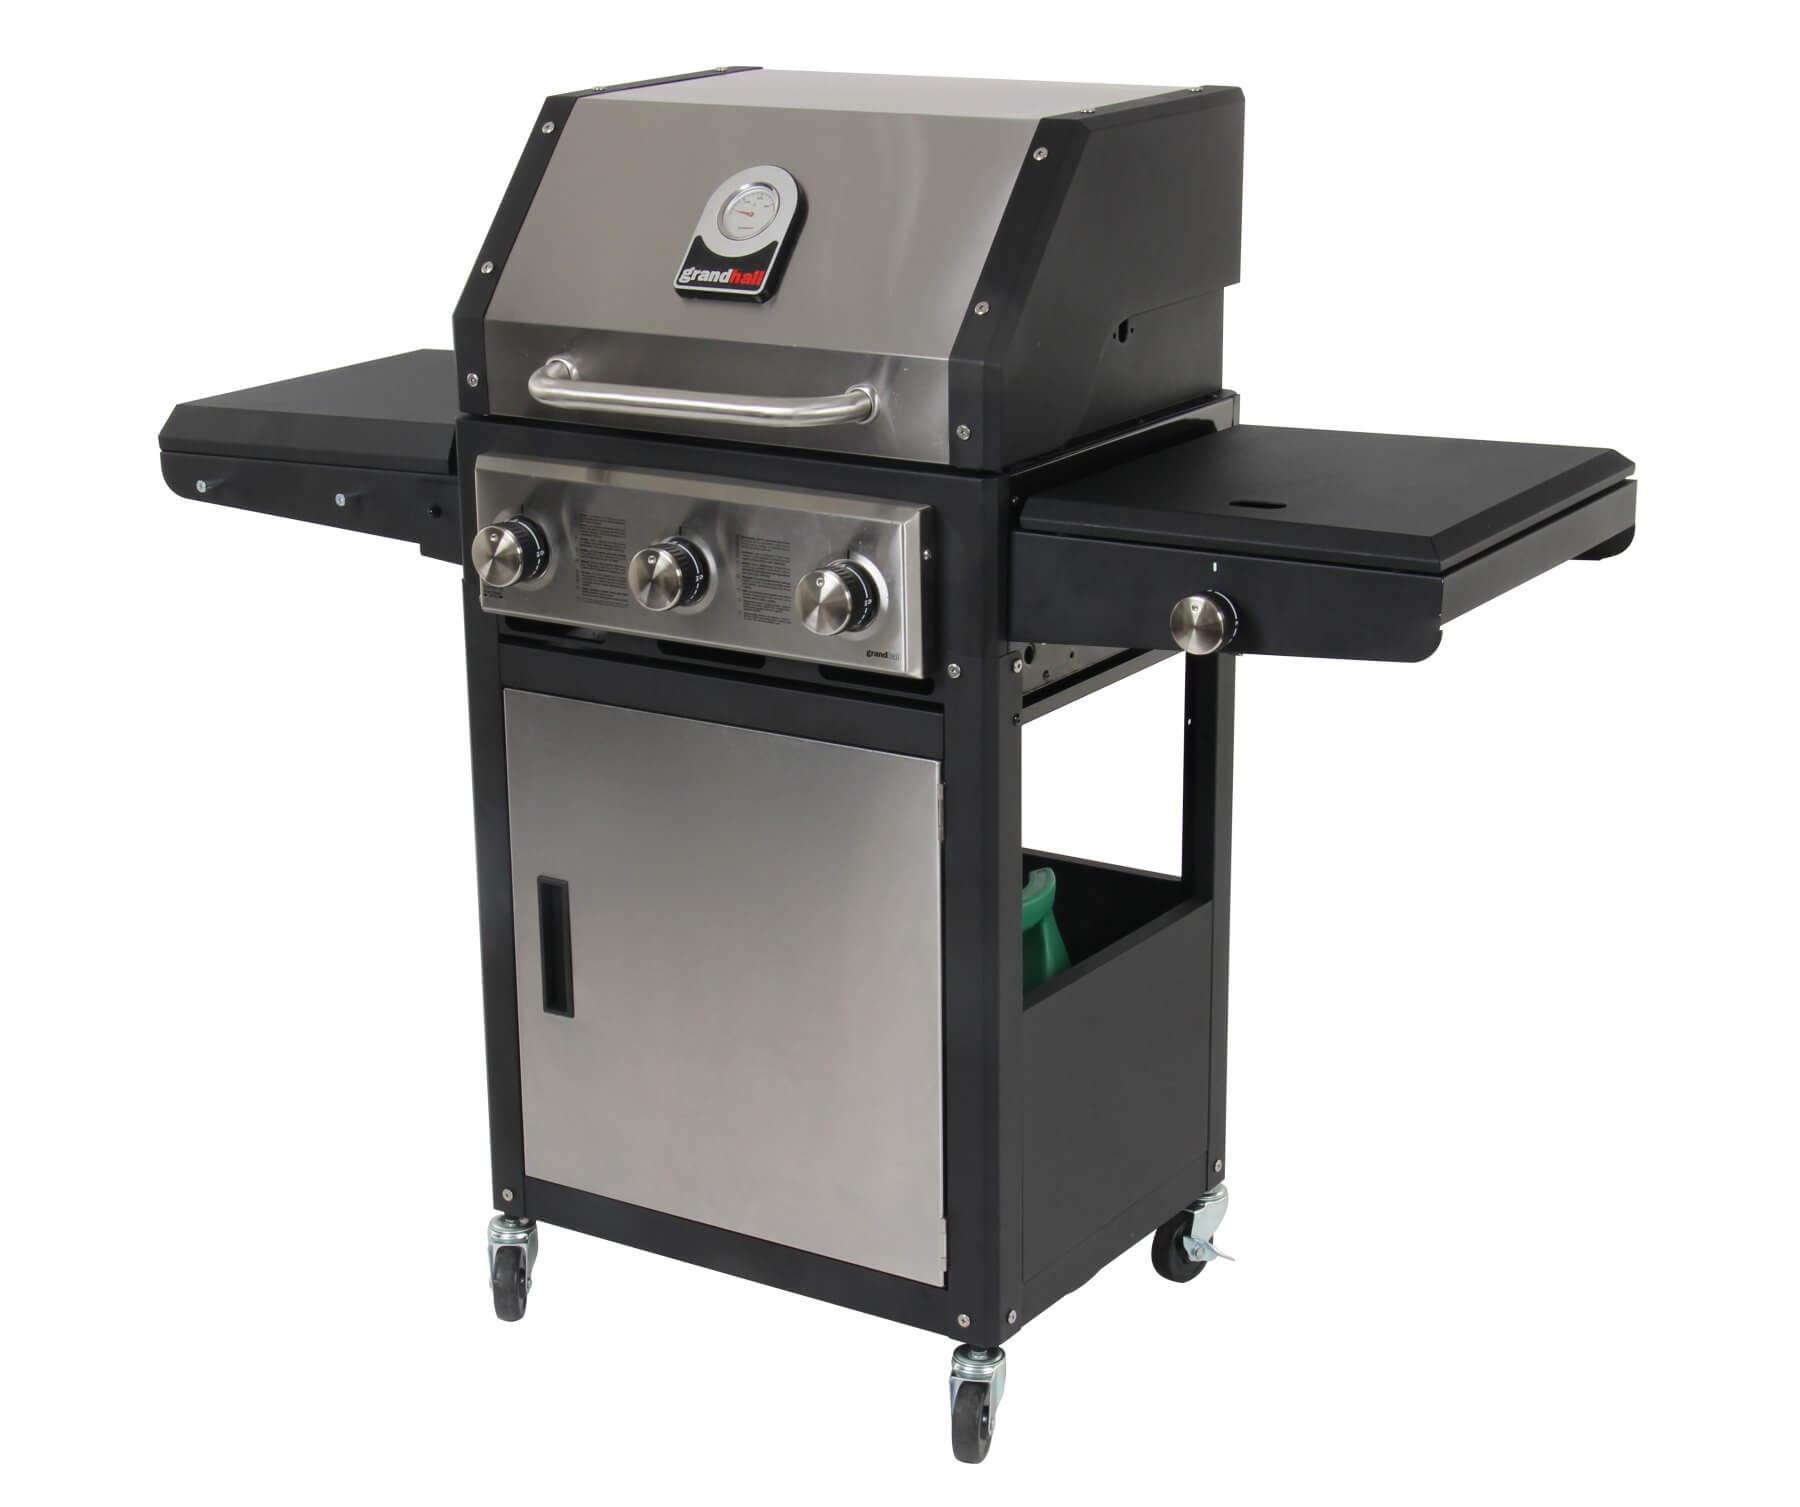 xenon 3 brander barbecue roost buitenkoken. Black Bedroom Furniture Sets. Home Design Ideas